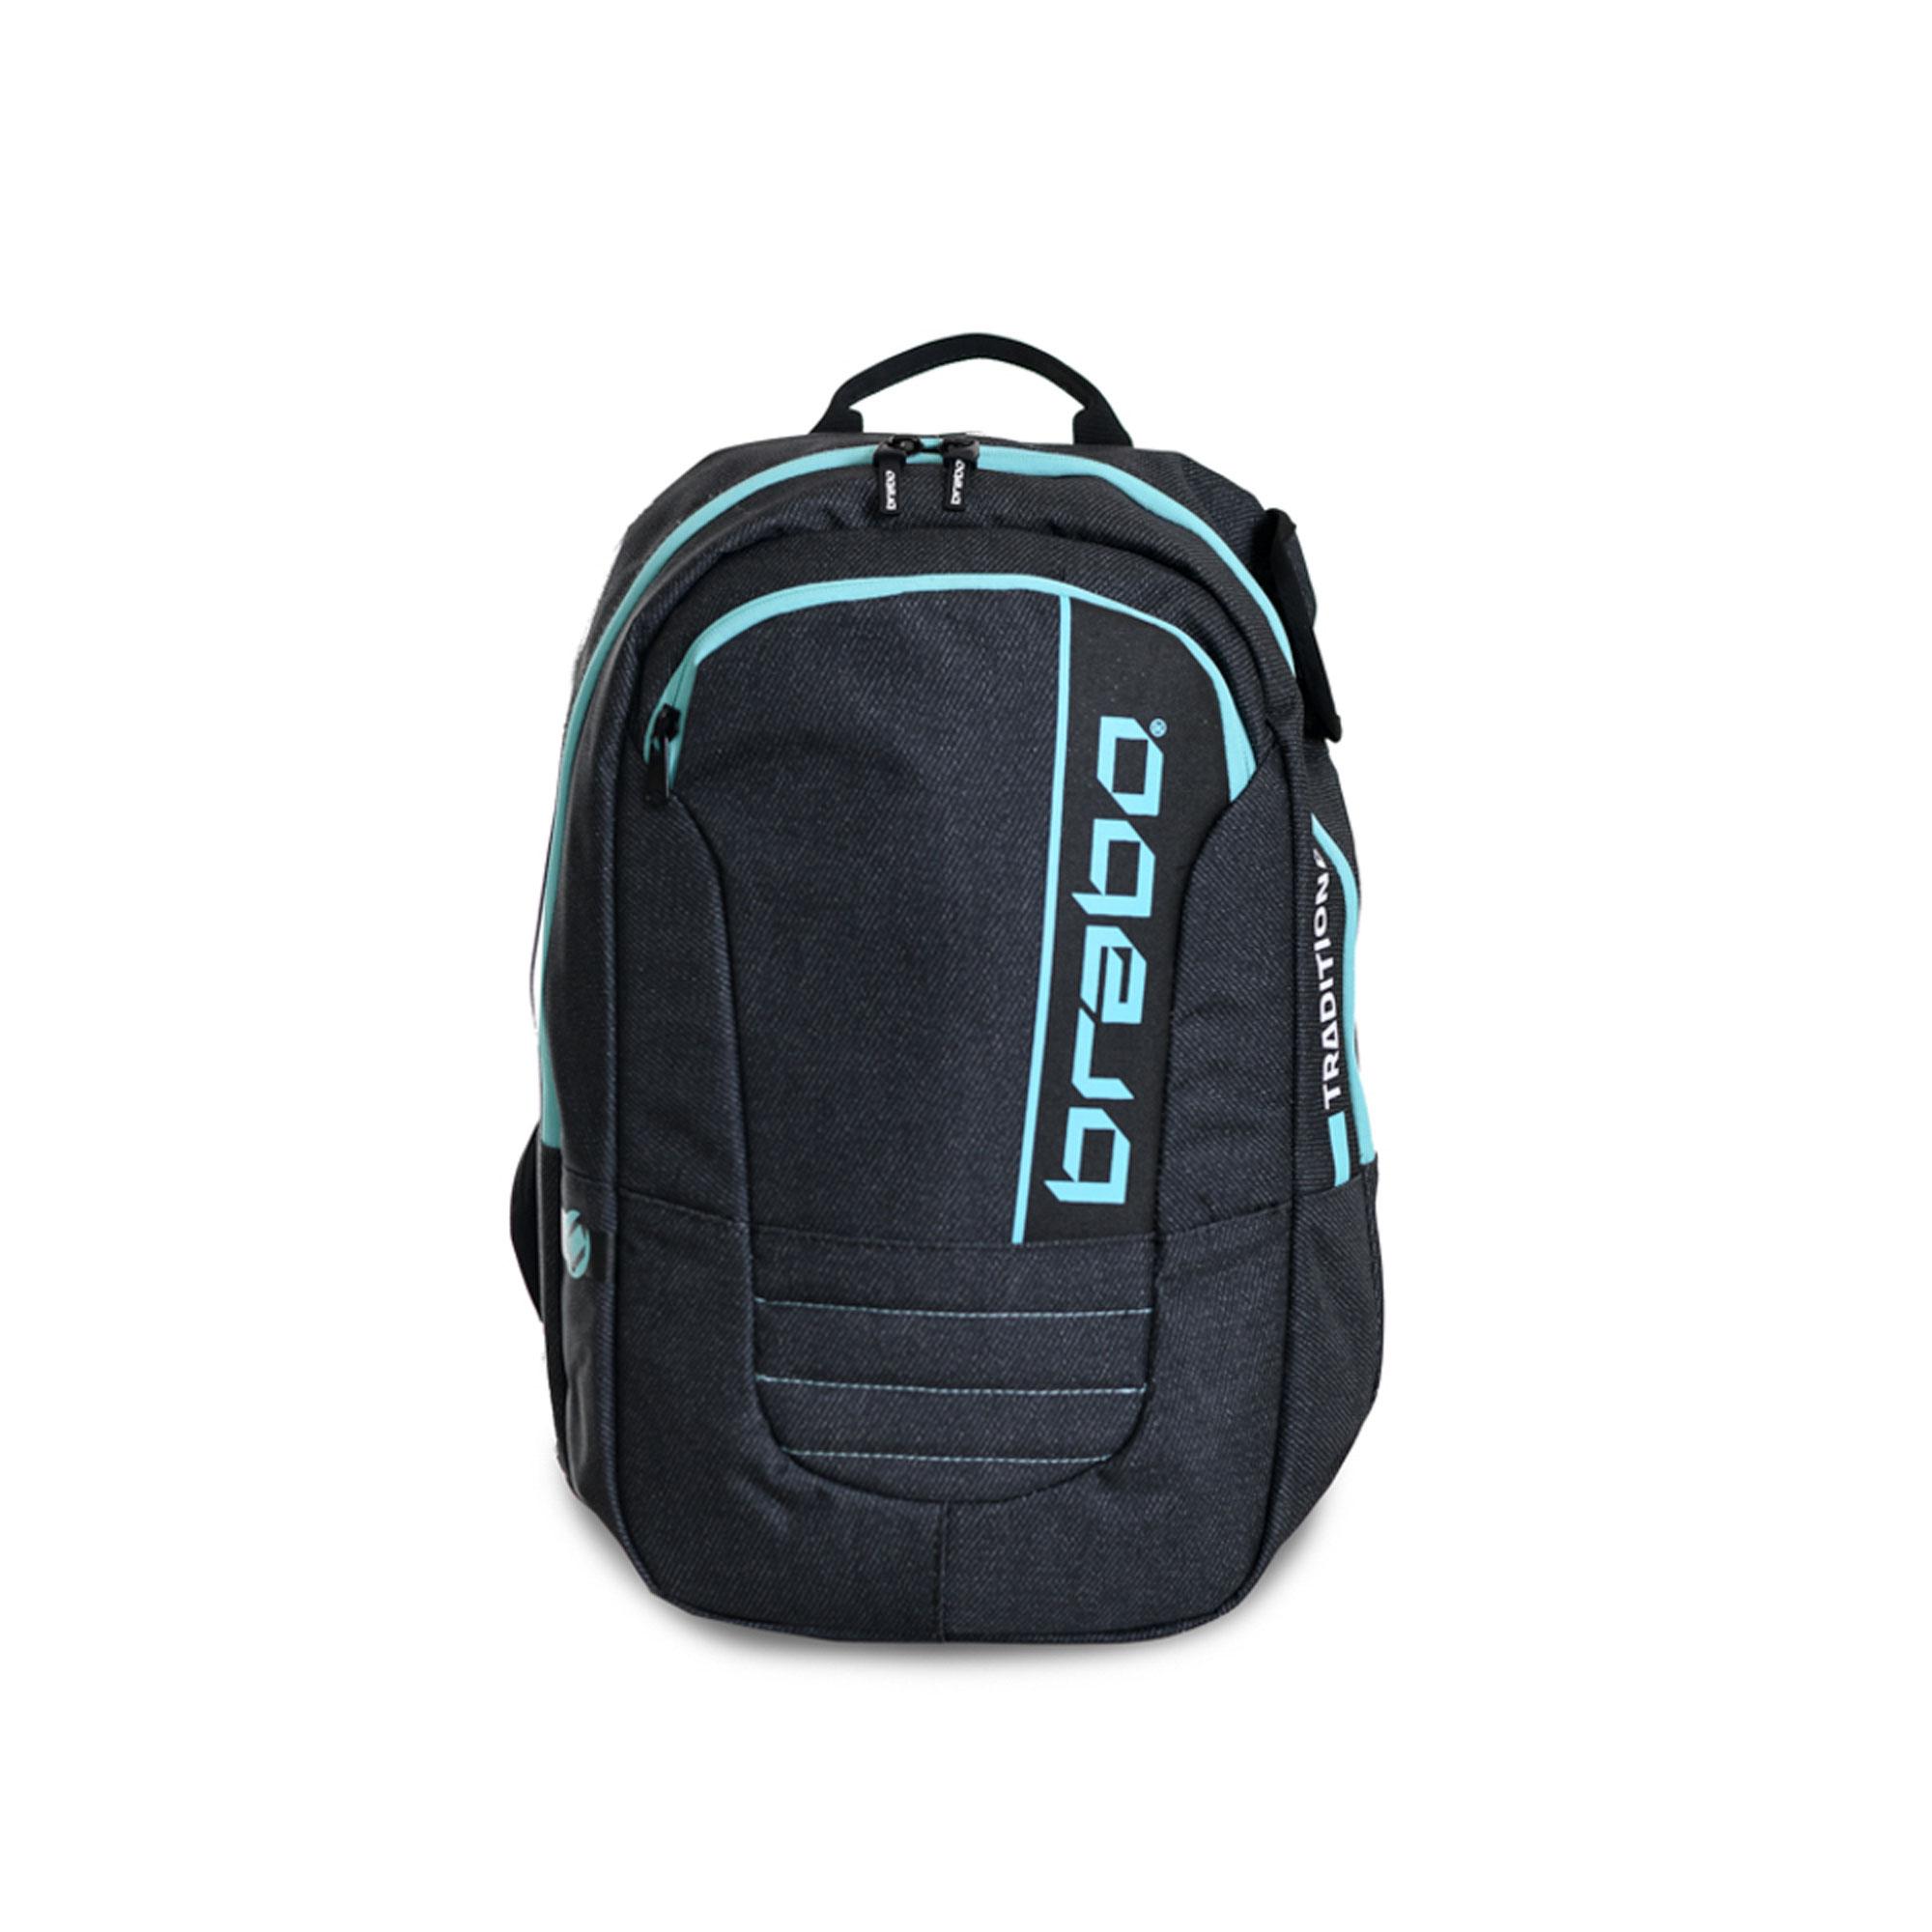 Afbeelding van Brabo Backpack Traditional Denim Hockeytas Junior Black Aqua